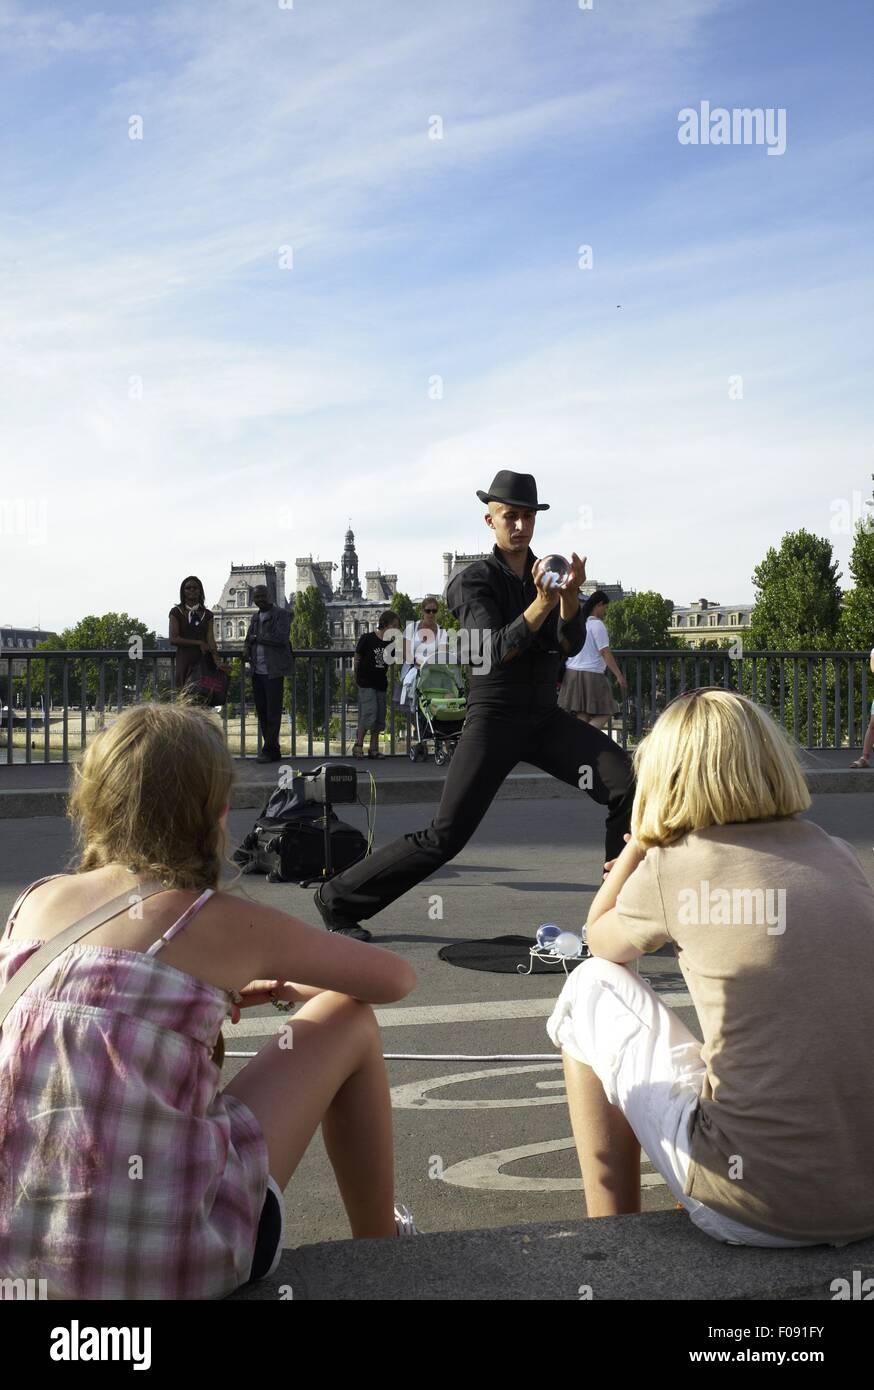 Juggler performing on Pont Saint-Louis bridge in Paris, France Stock Photo